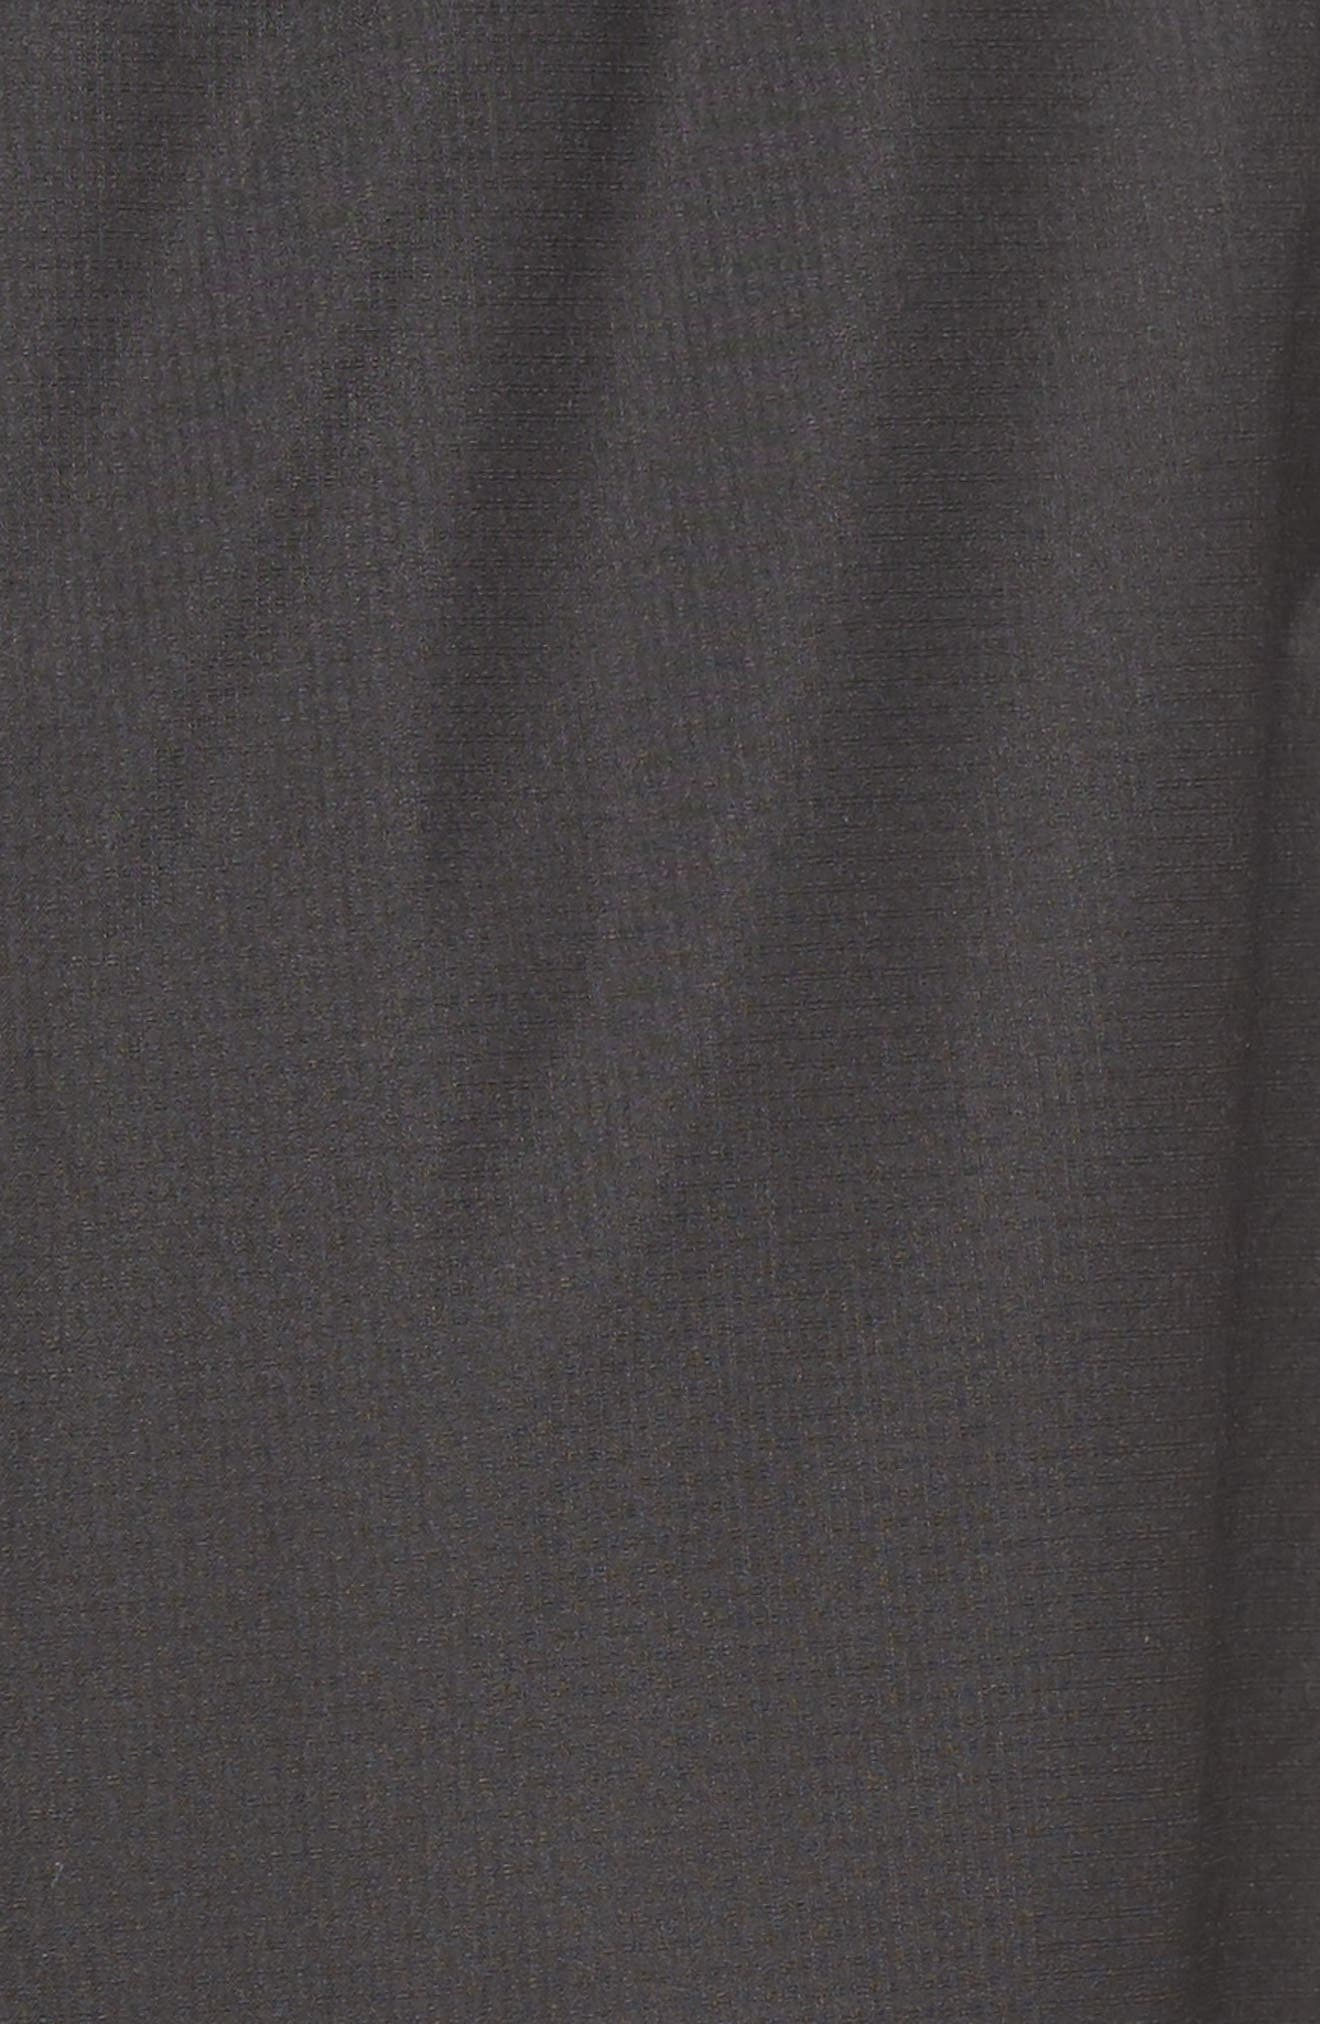 Venture Waterproof Pants,                             Alternate thumbnail 5, color,                             Black